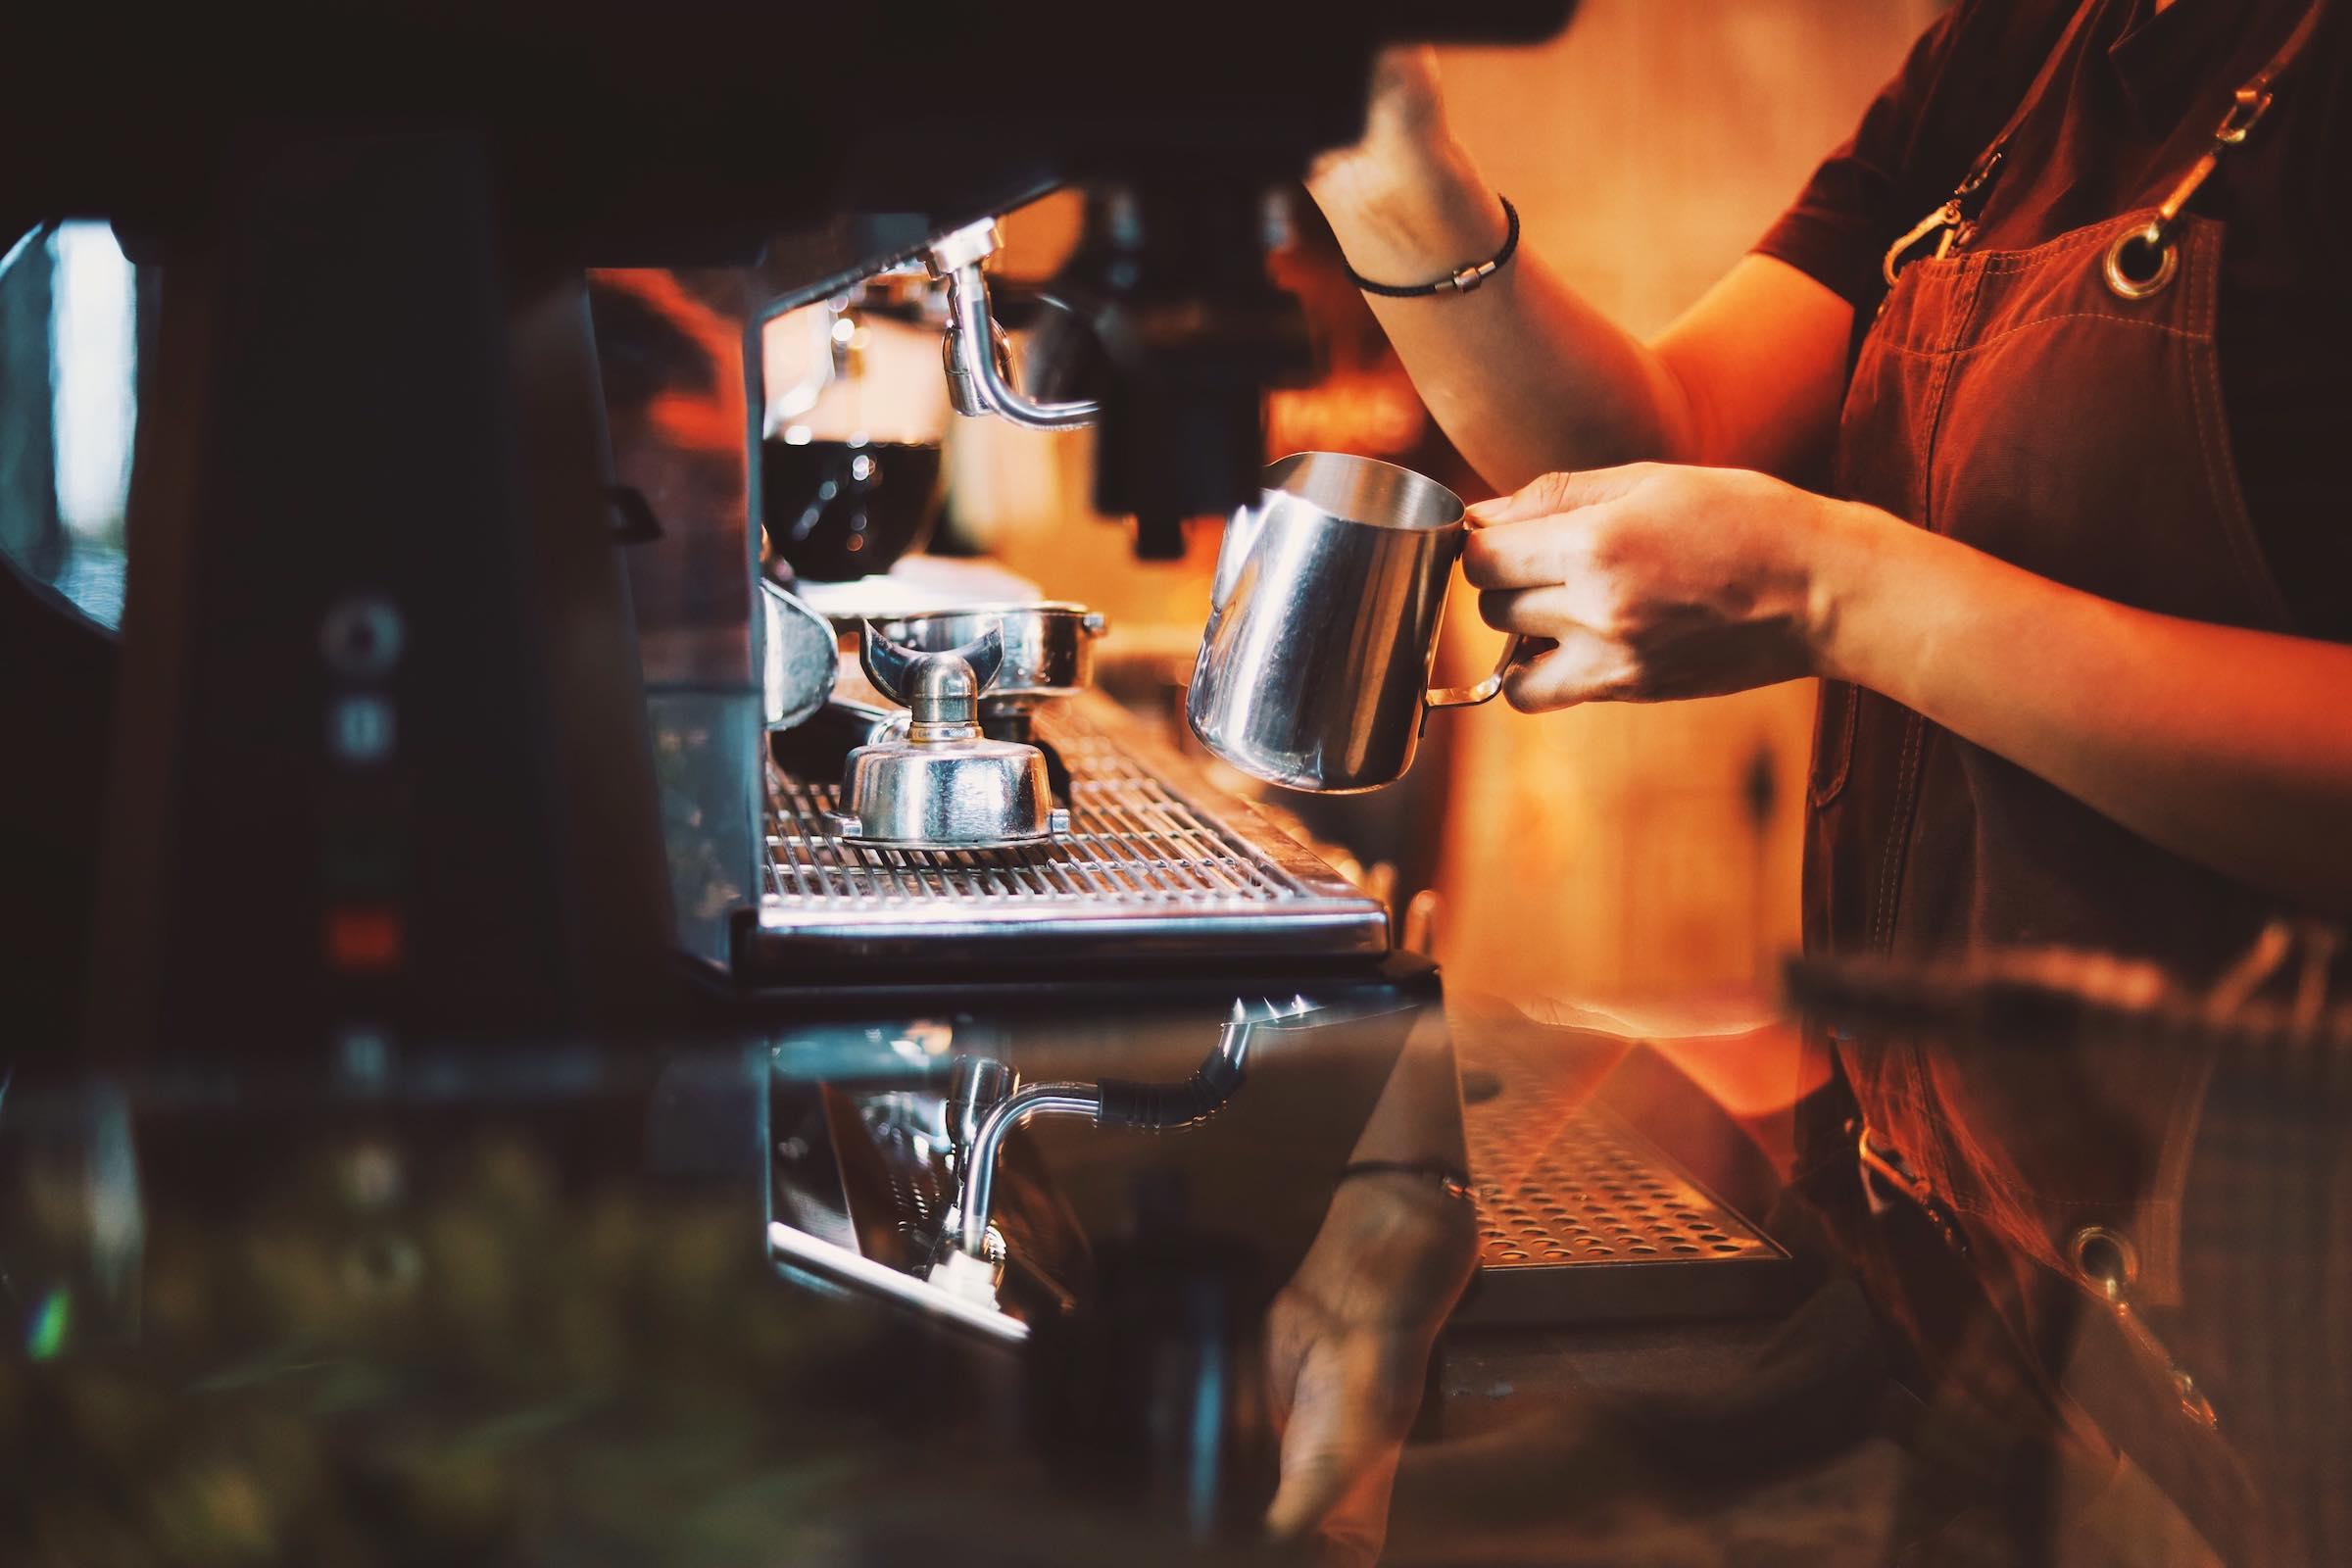 Barformat Hannover - Foodtruck | Coffee | Kaffee | Espresso | Wein | Event | Hochzeit | Fingerfood | Gastronomie | Catering